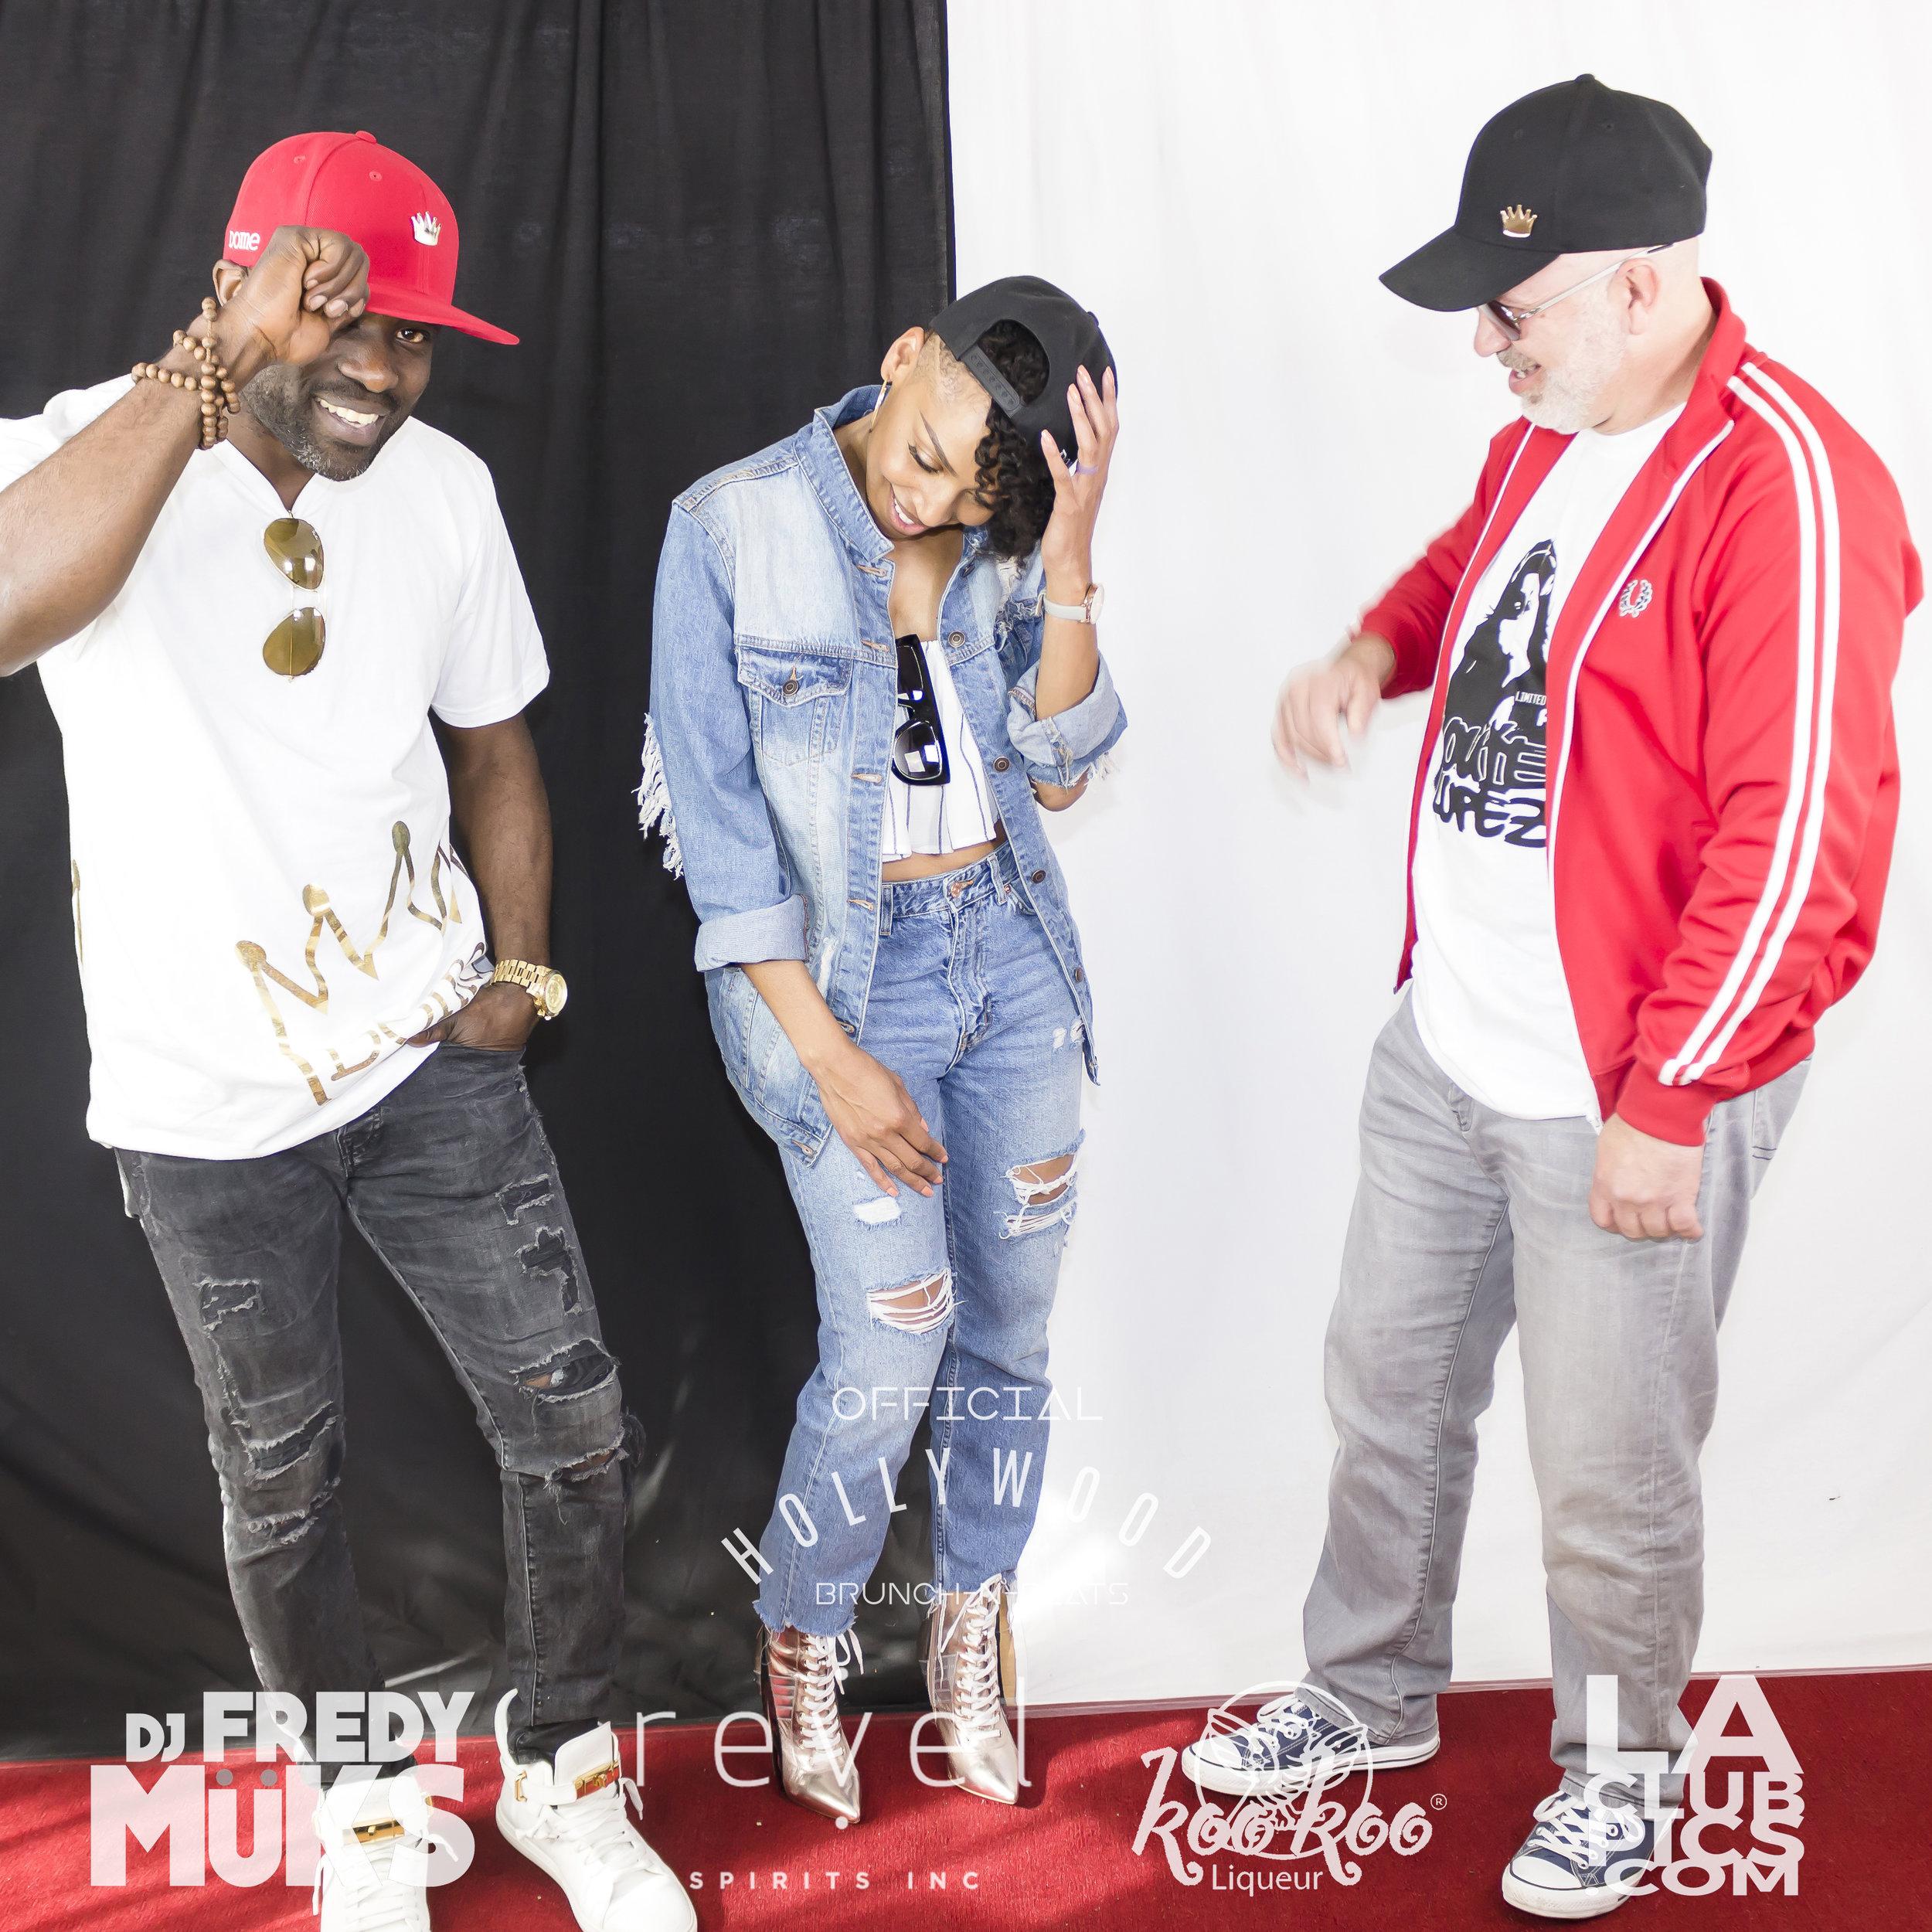 Hollywood Brunch-N-Beats - 03-18-18_120.jpg